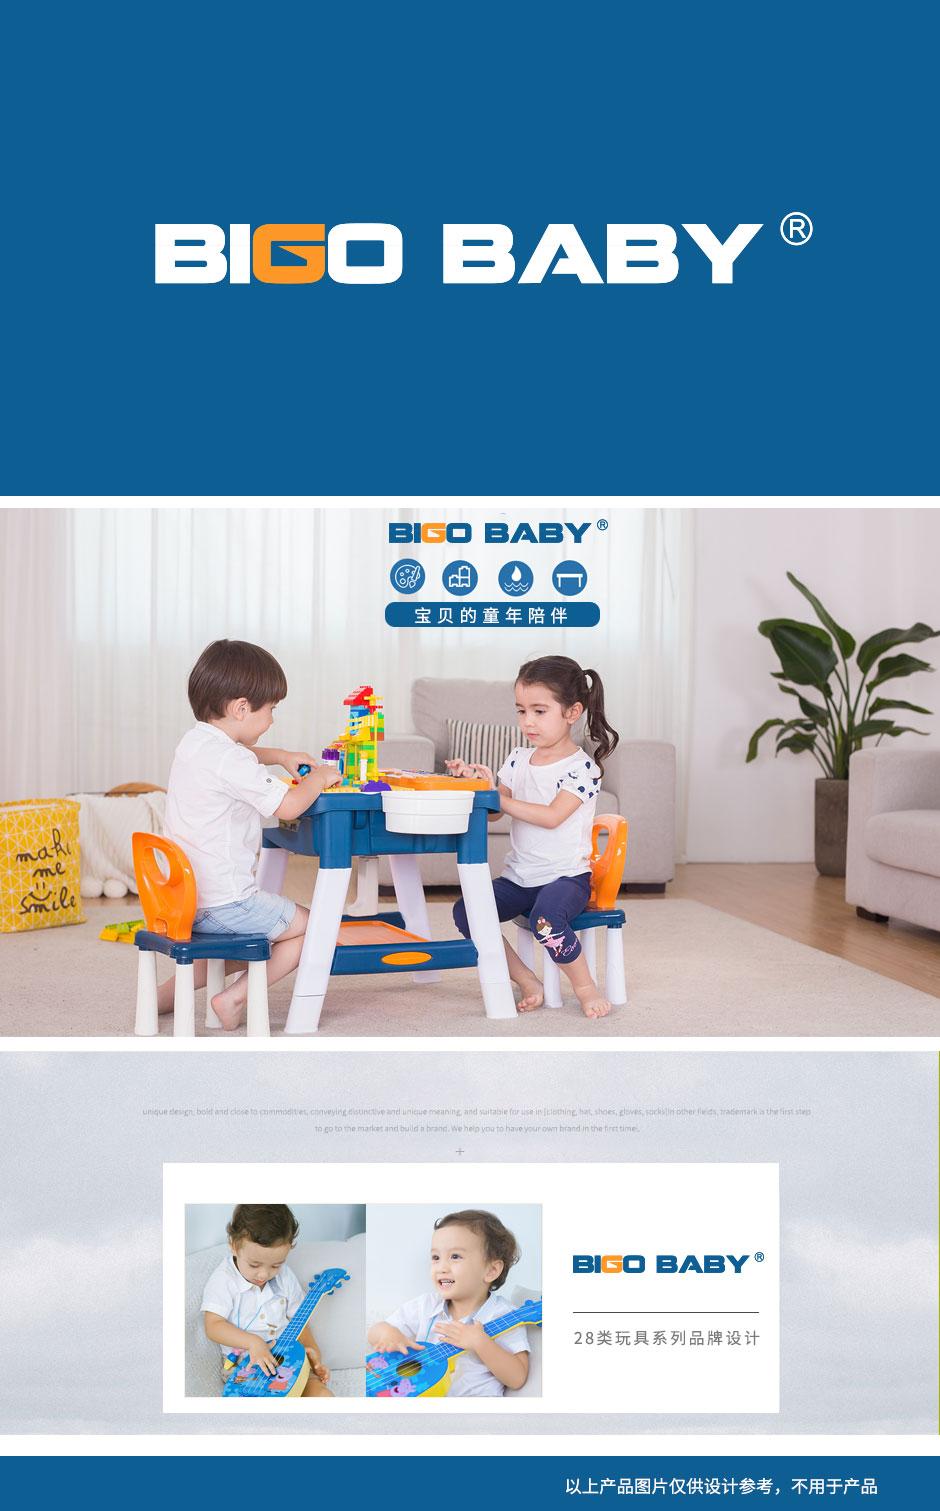 第28类-BIGO BABY